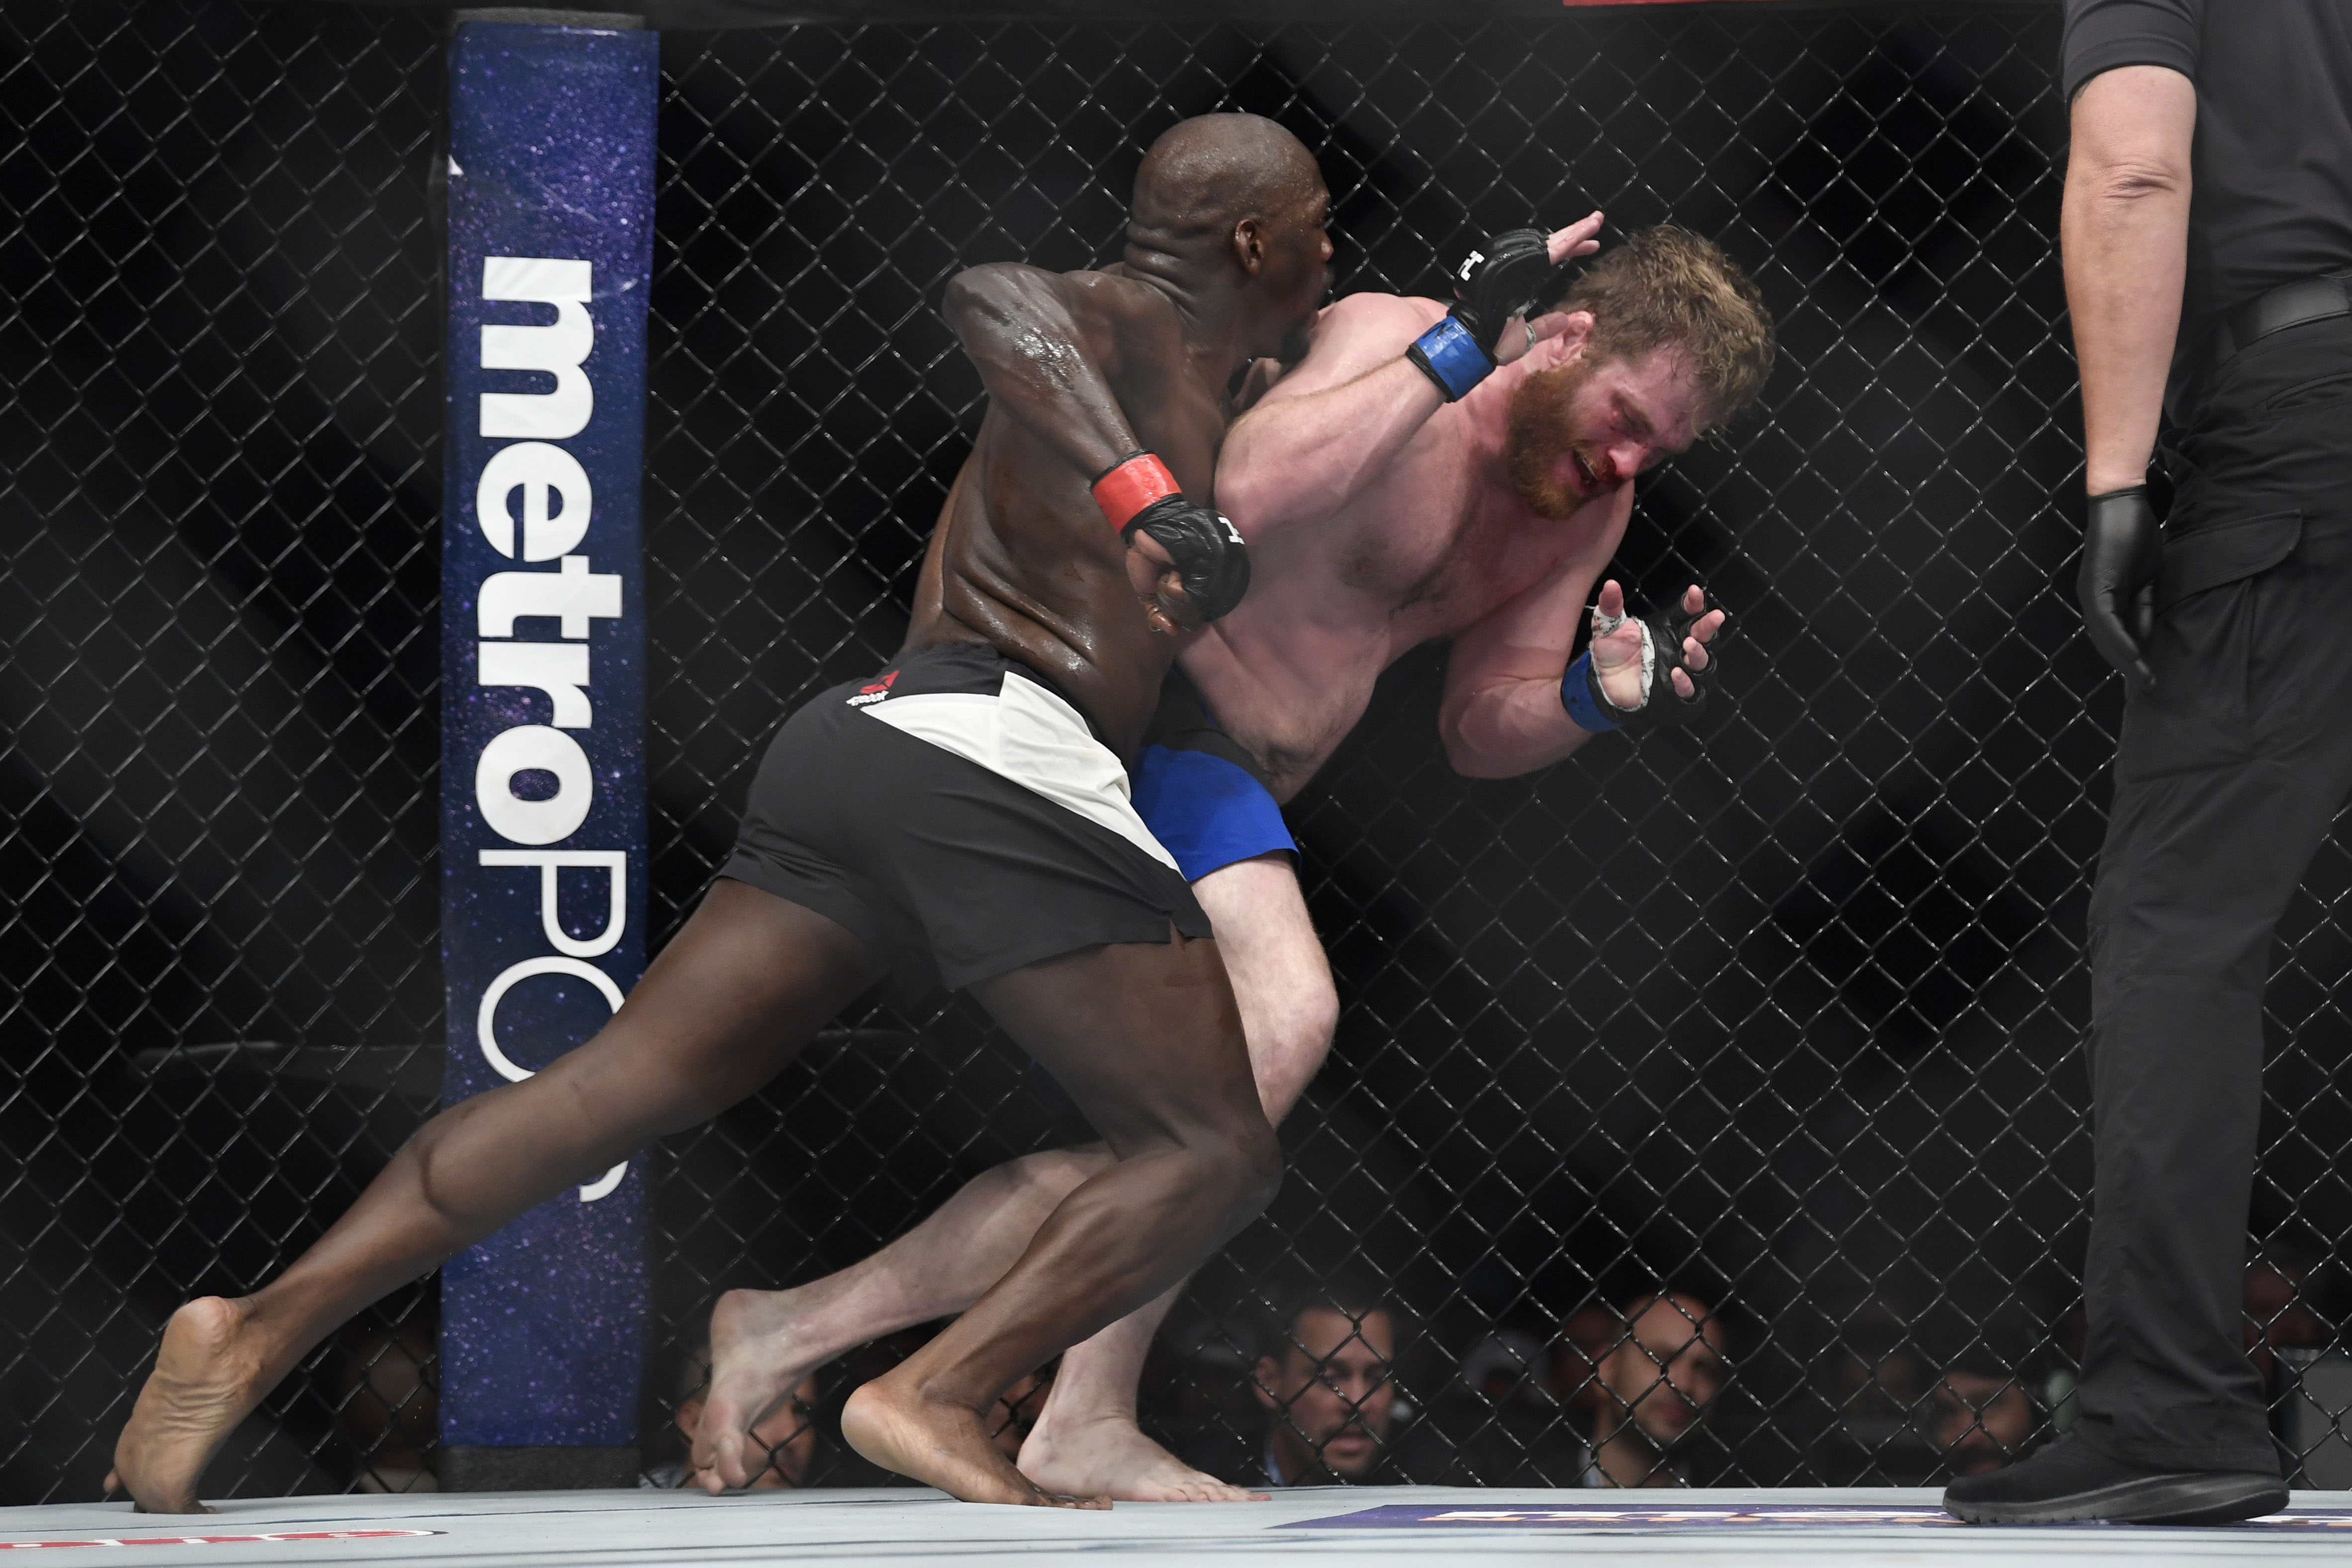 MMA: The Ultimate Fighter-Cannonier vs Roehrick